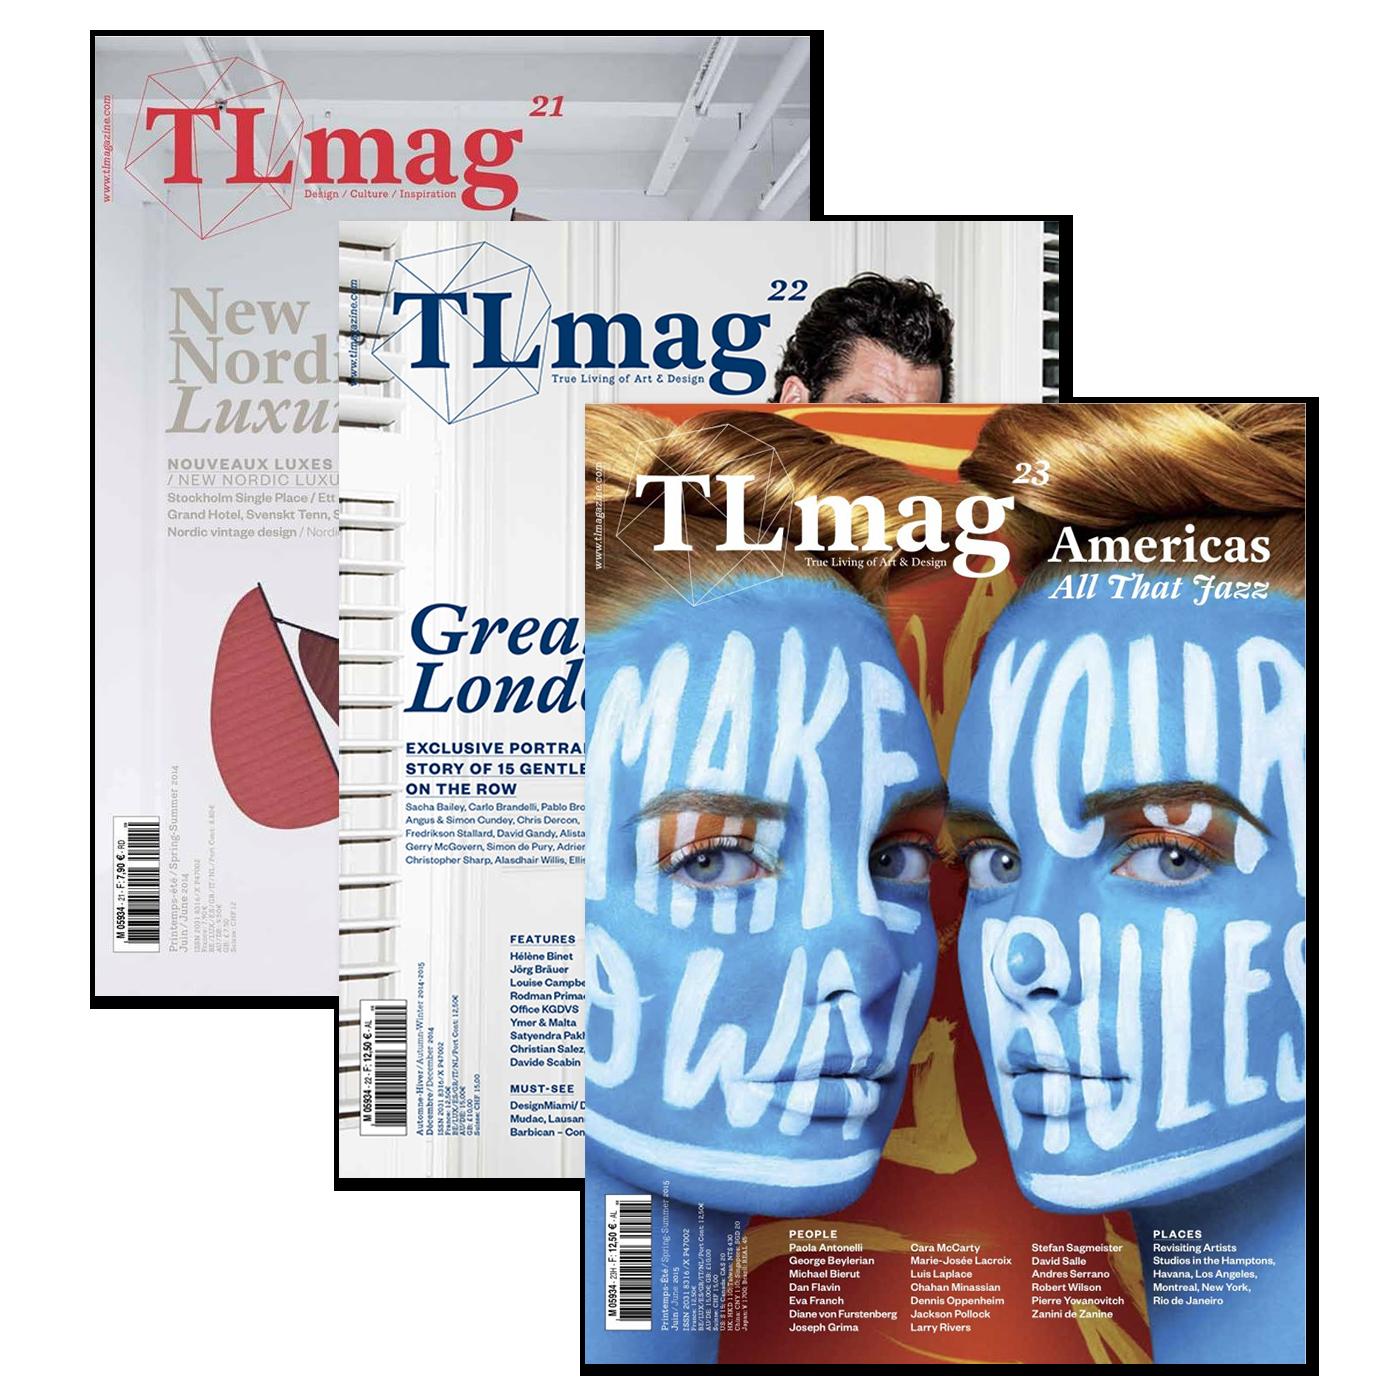 TLM_Magazine-stack_02